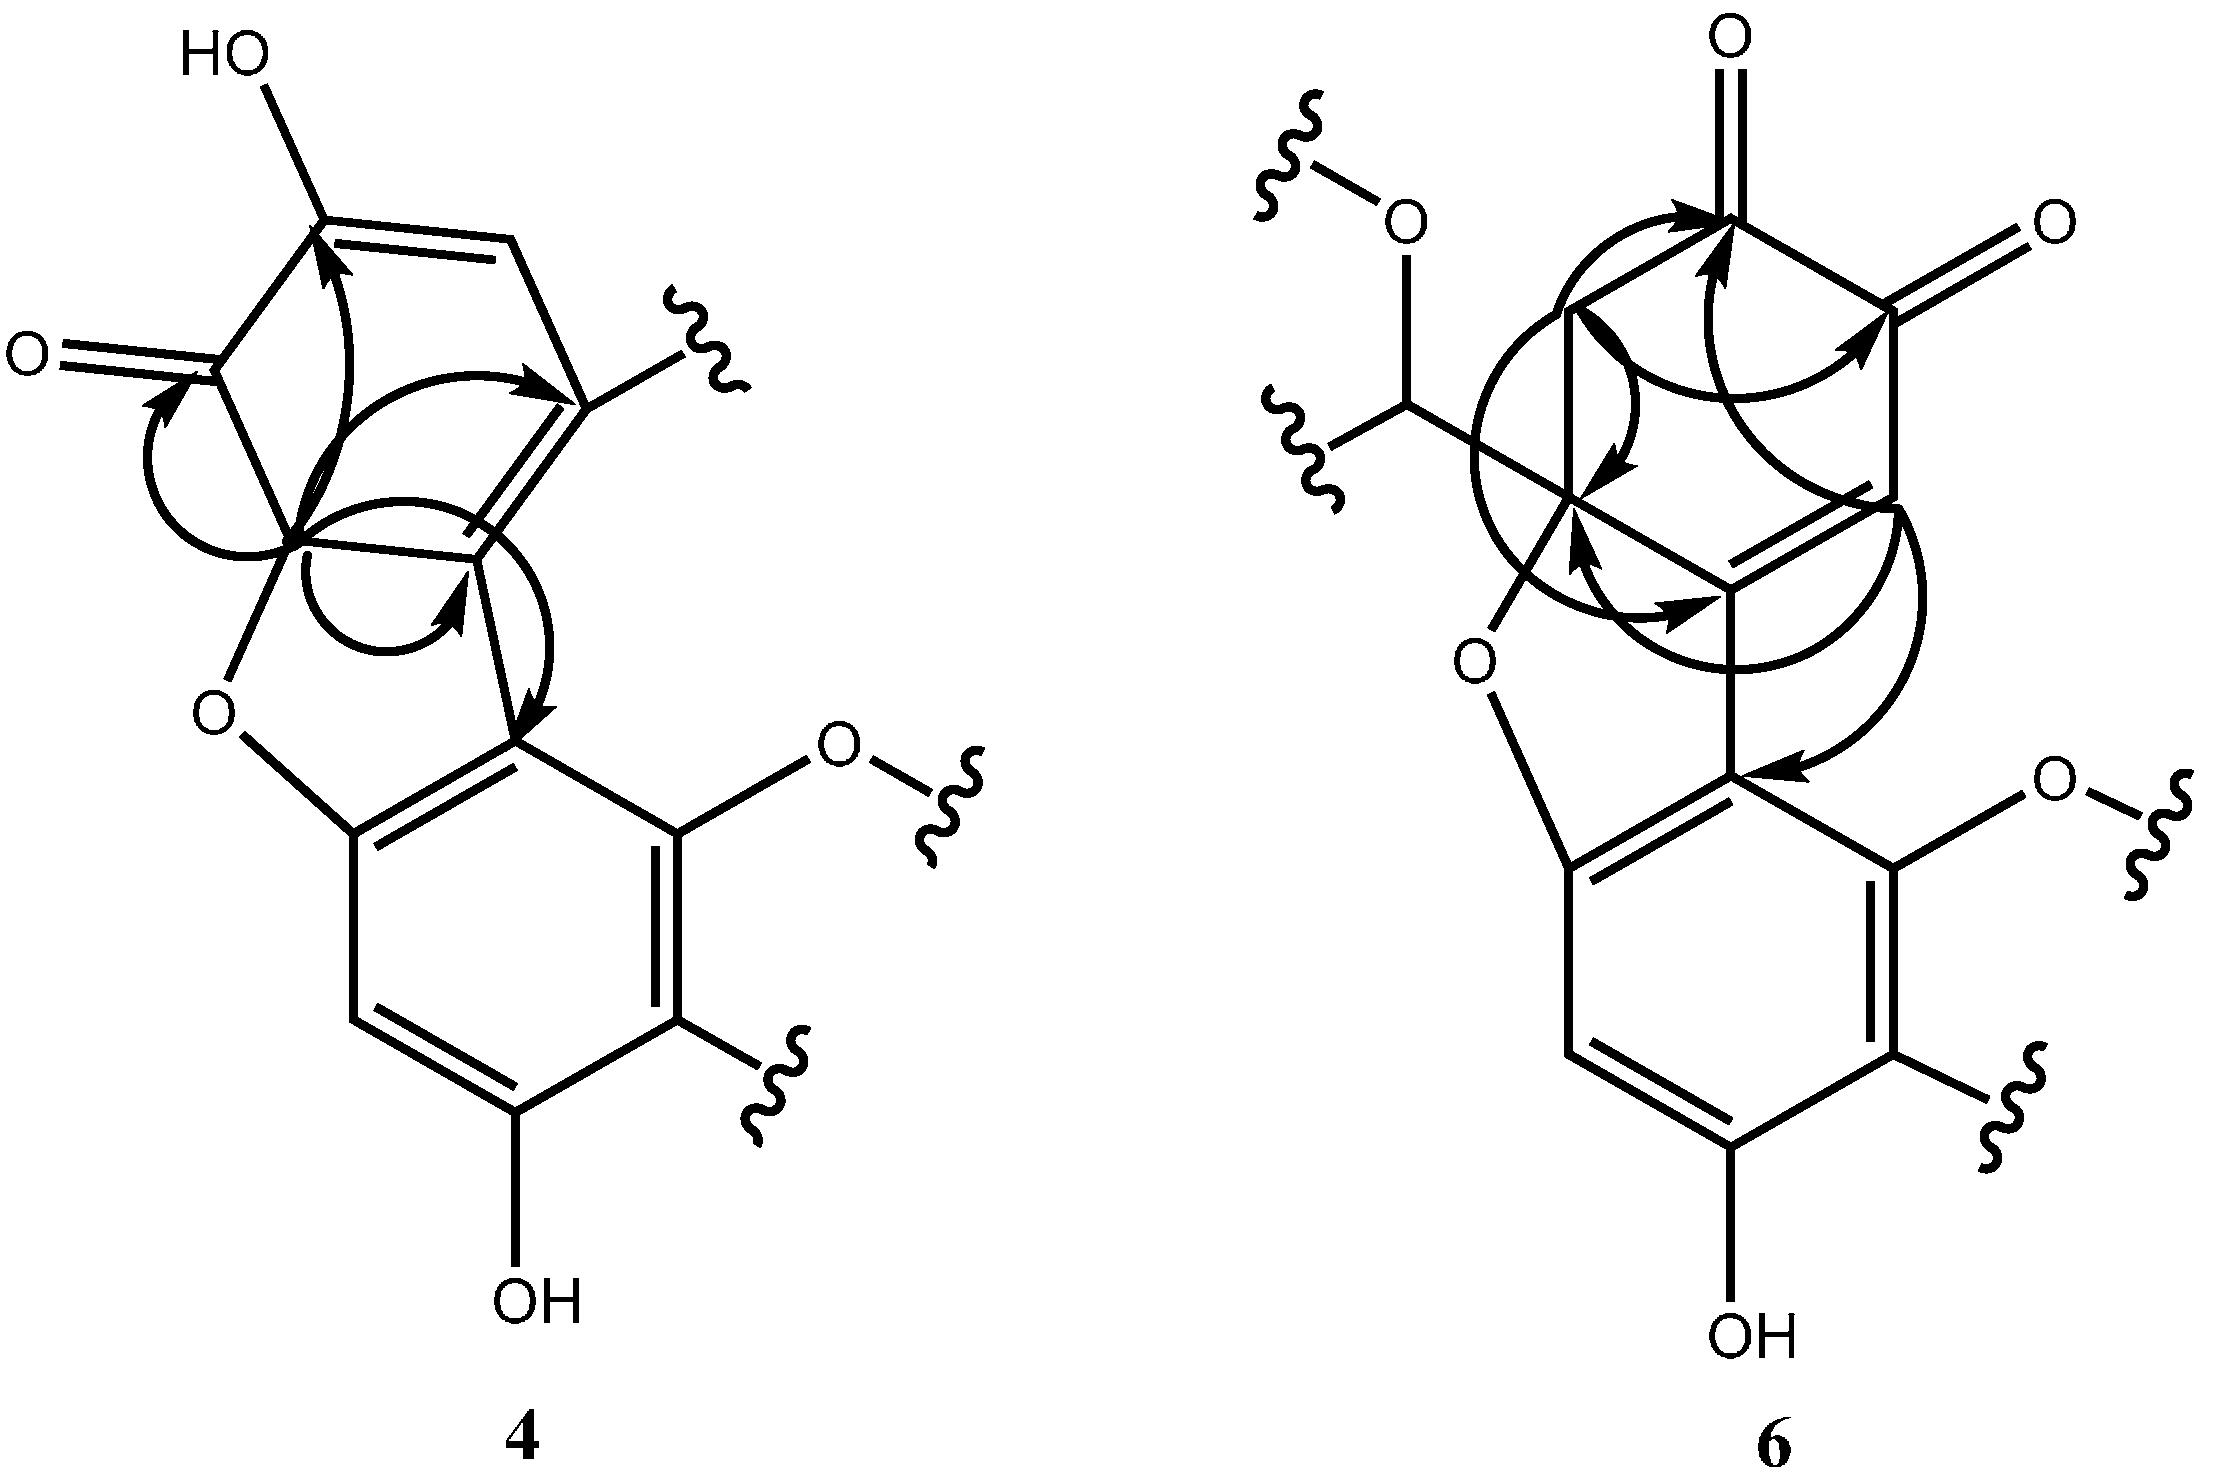 Molecules 21 00273 g003 1024